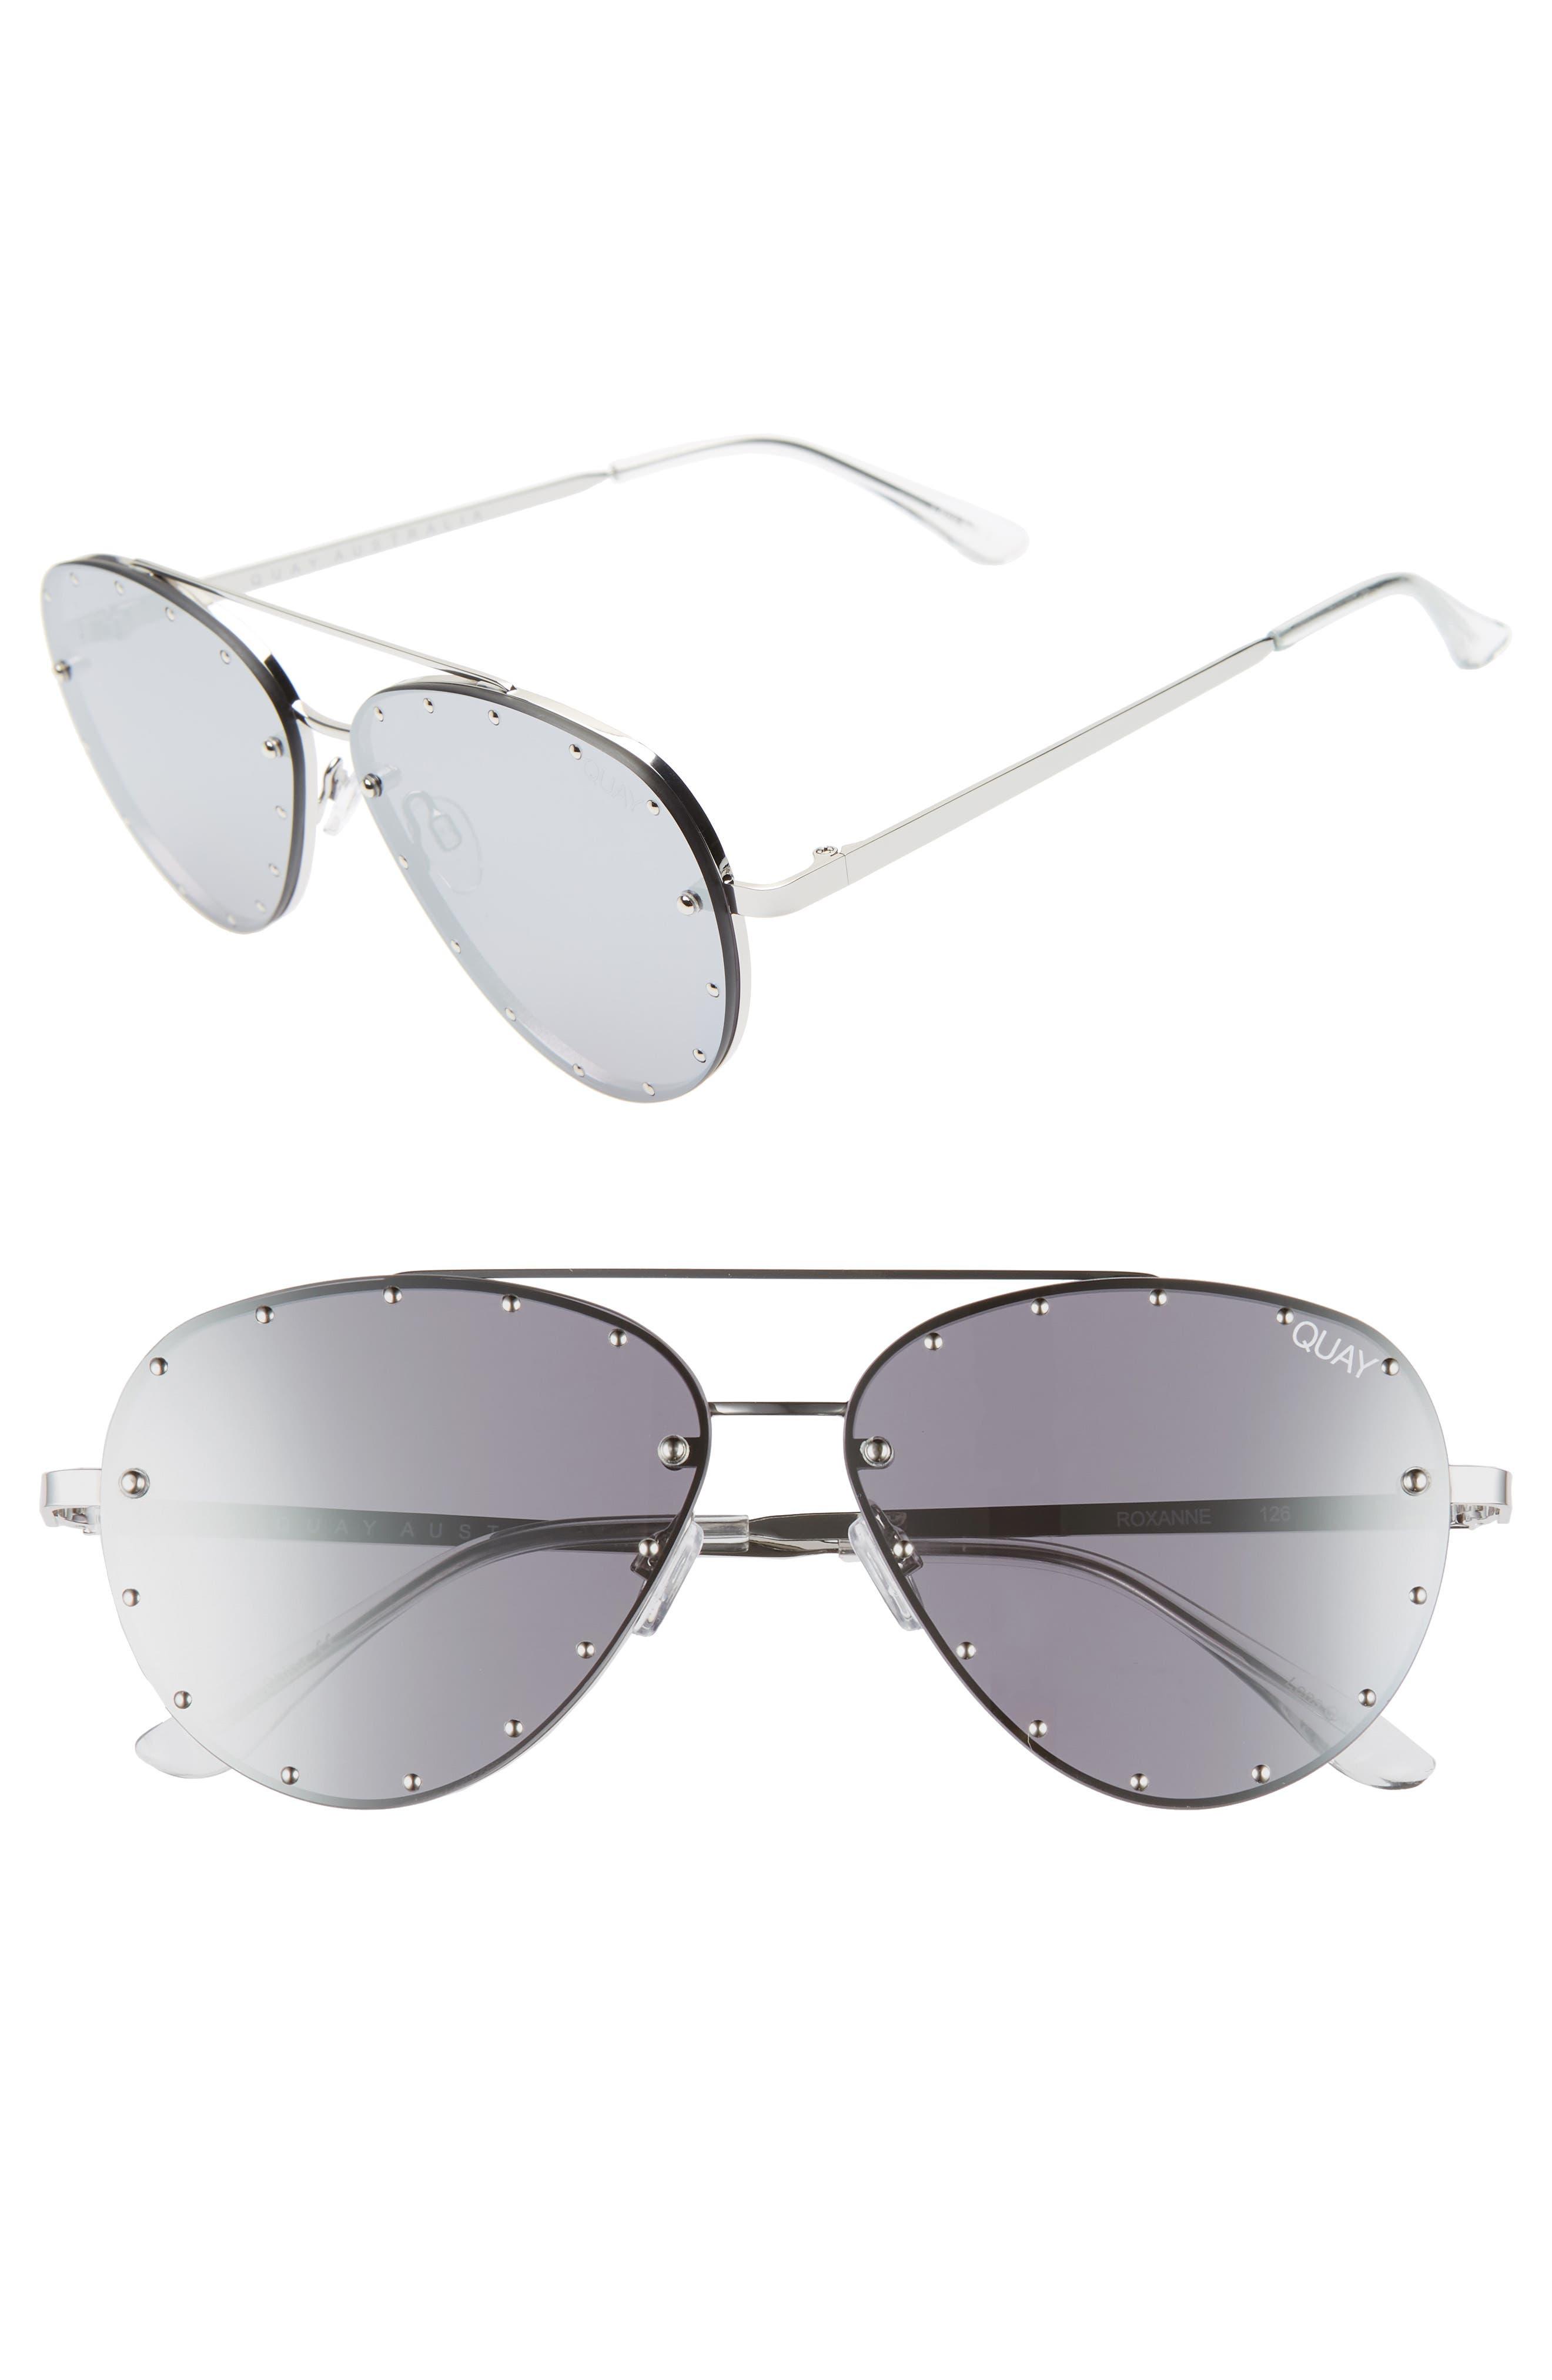 faec1200ae Women s Accessories NEW QUAY X Desi High Key Black Silver Mirror Sunglasses